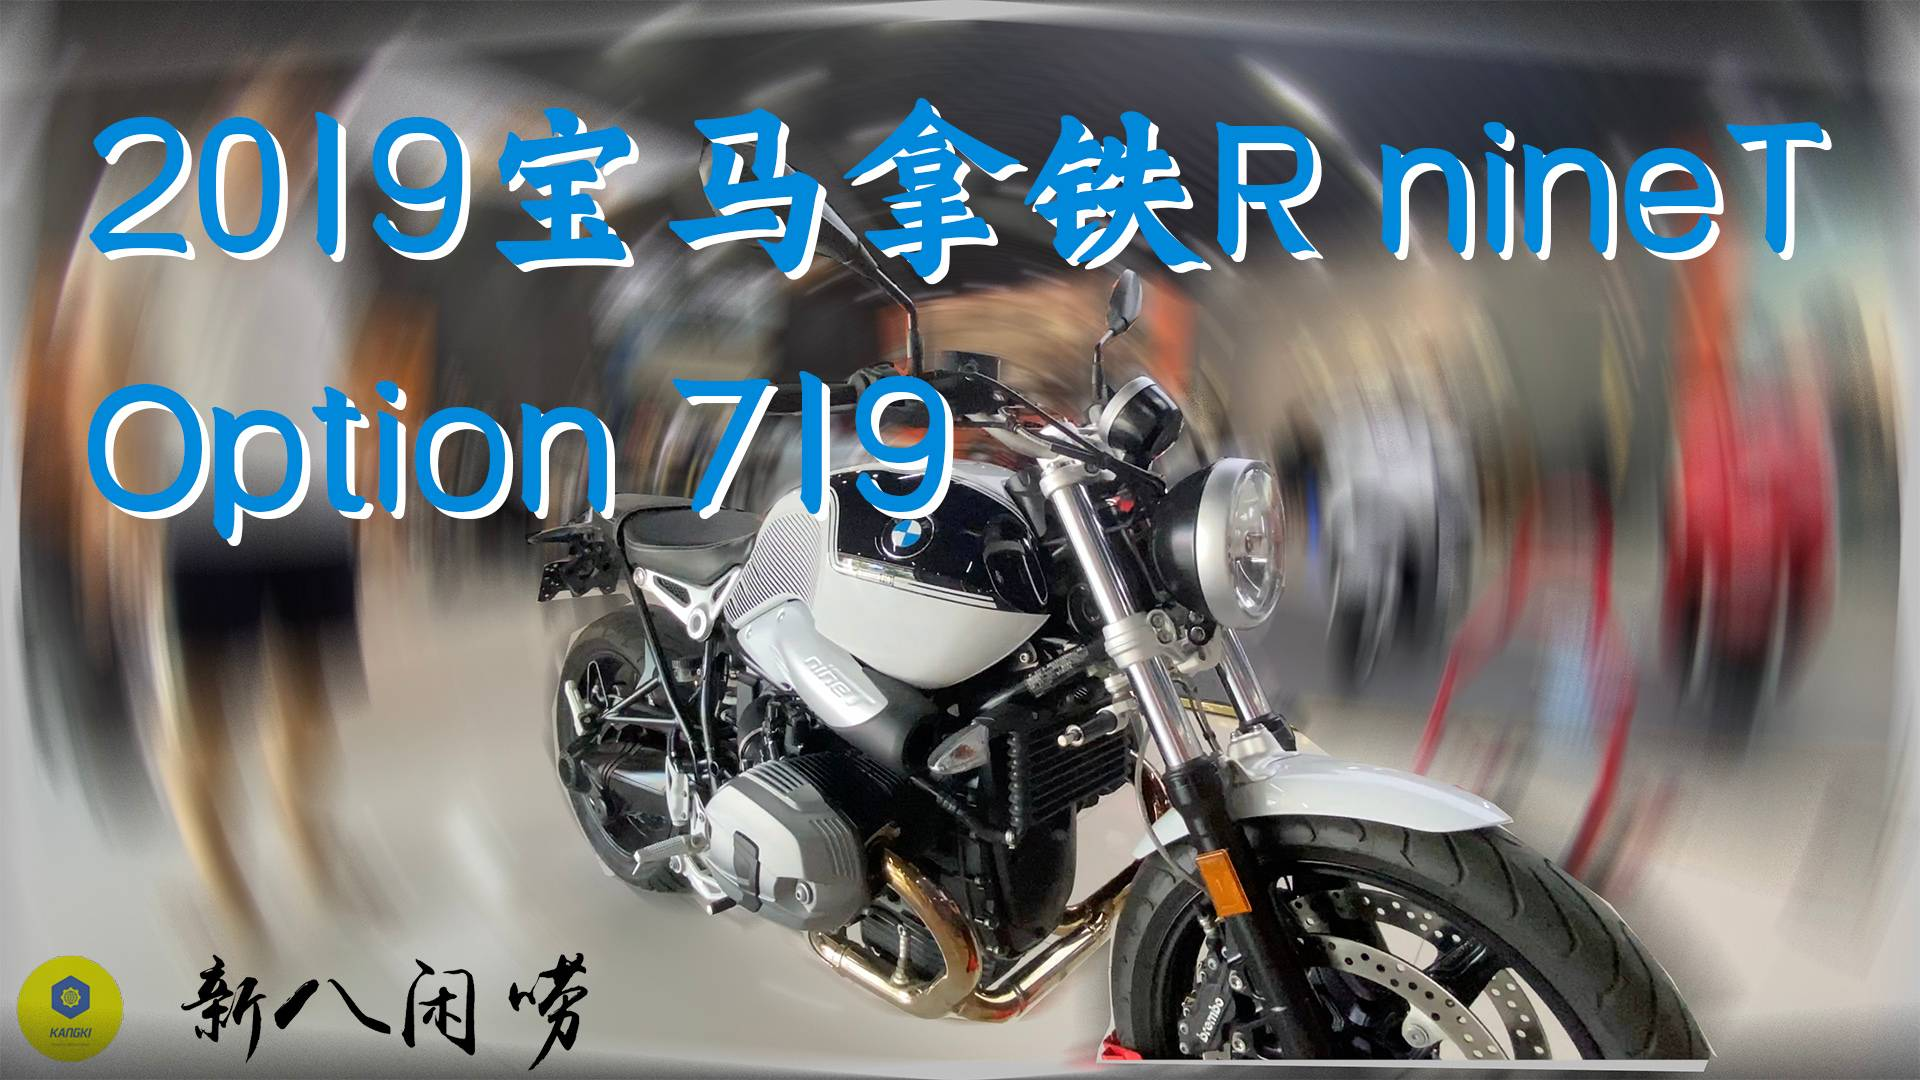 2019款宝马RnineT Option719限量版拿铁鉴赏